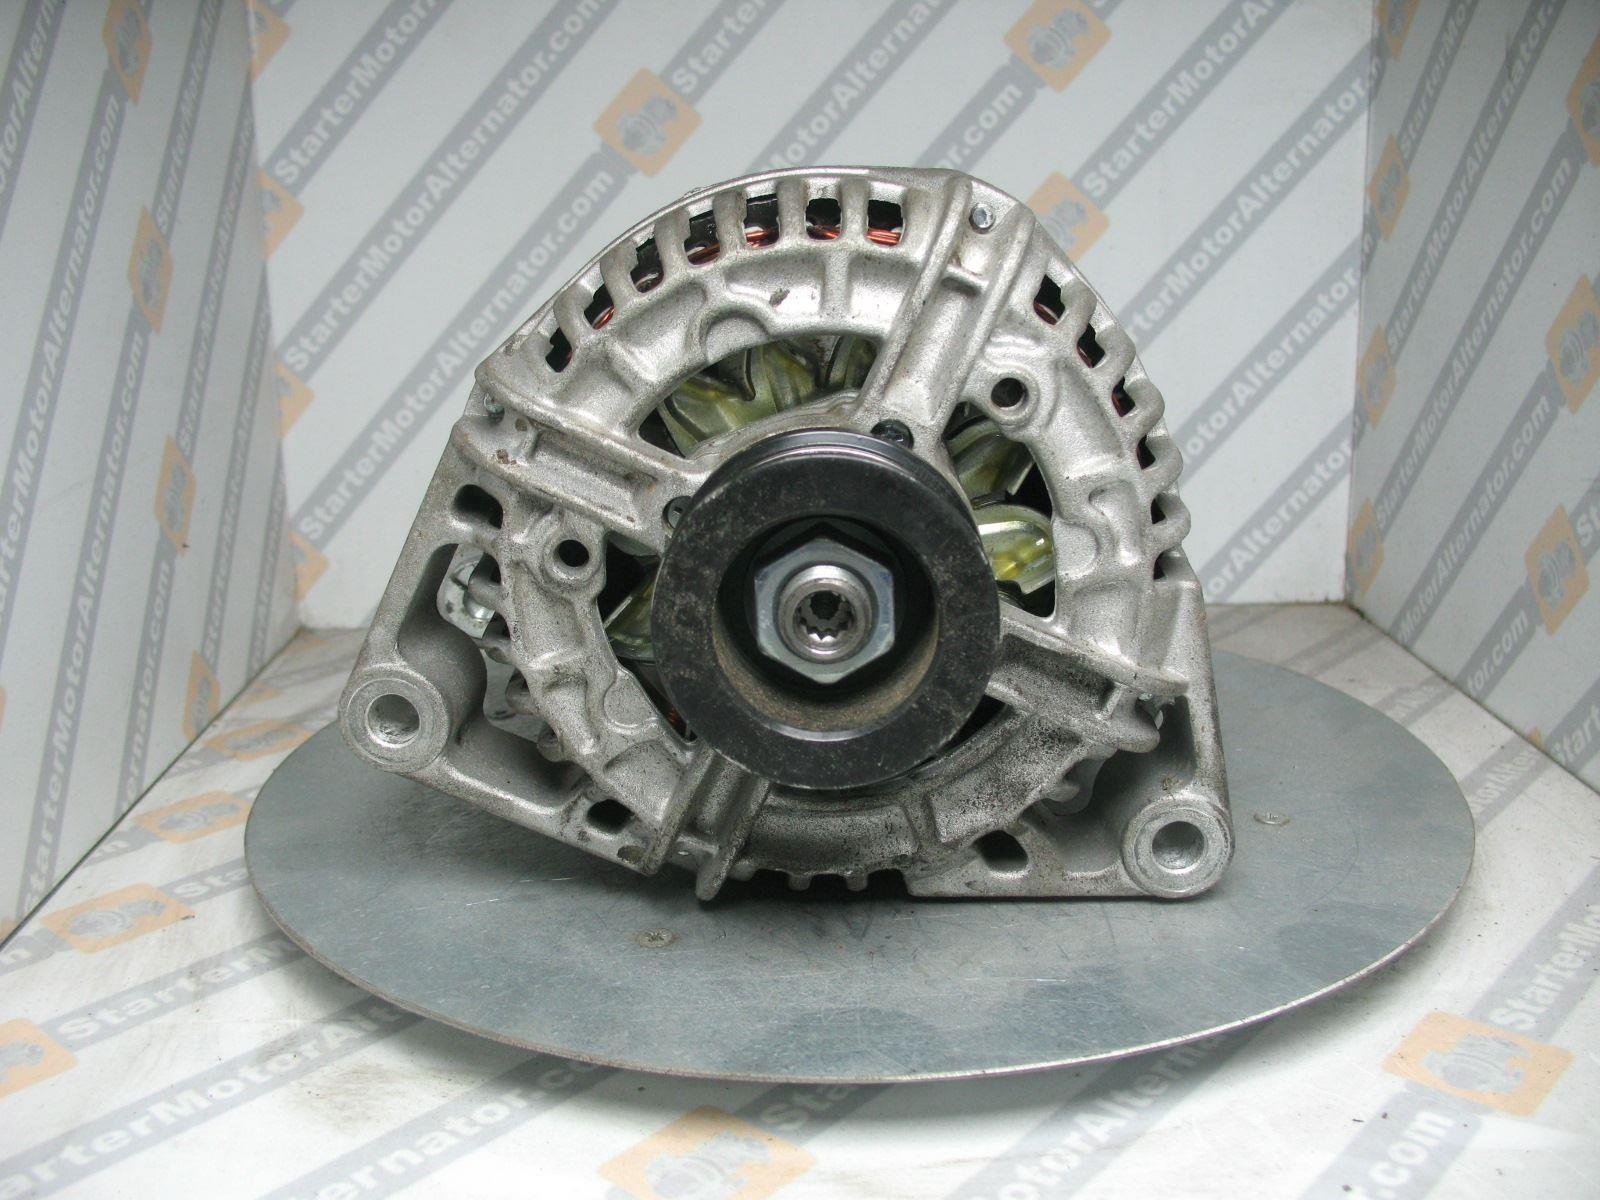 XIK2825 Alternator For Opel / Vauxhall